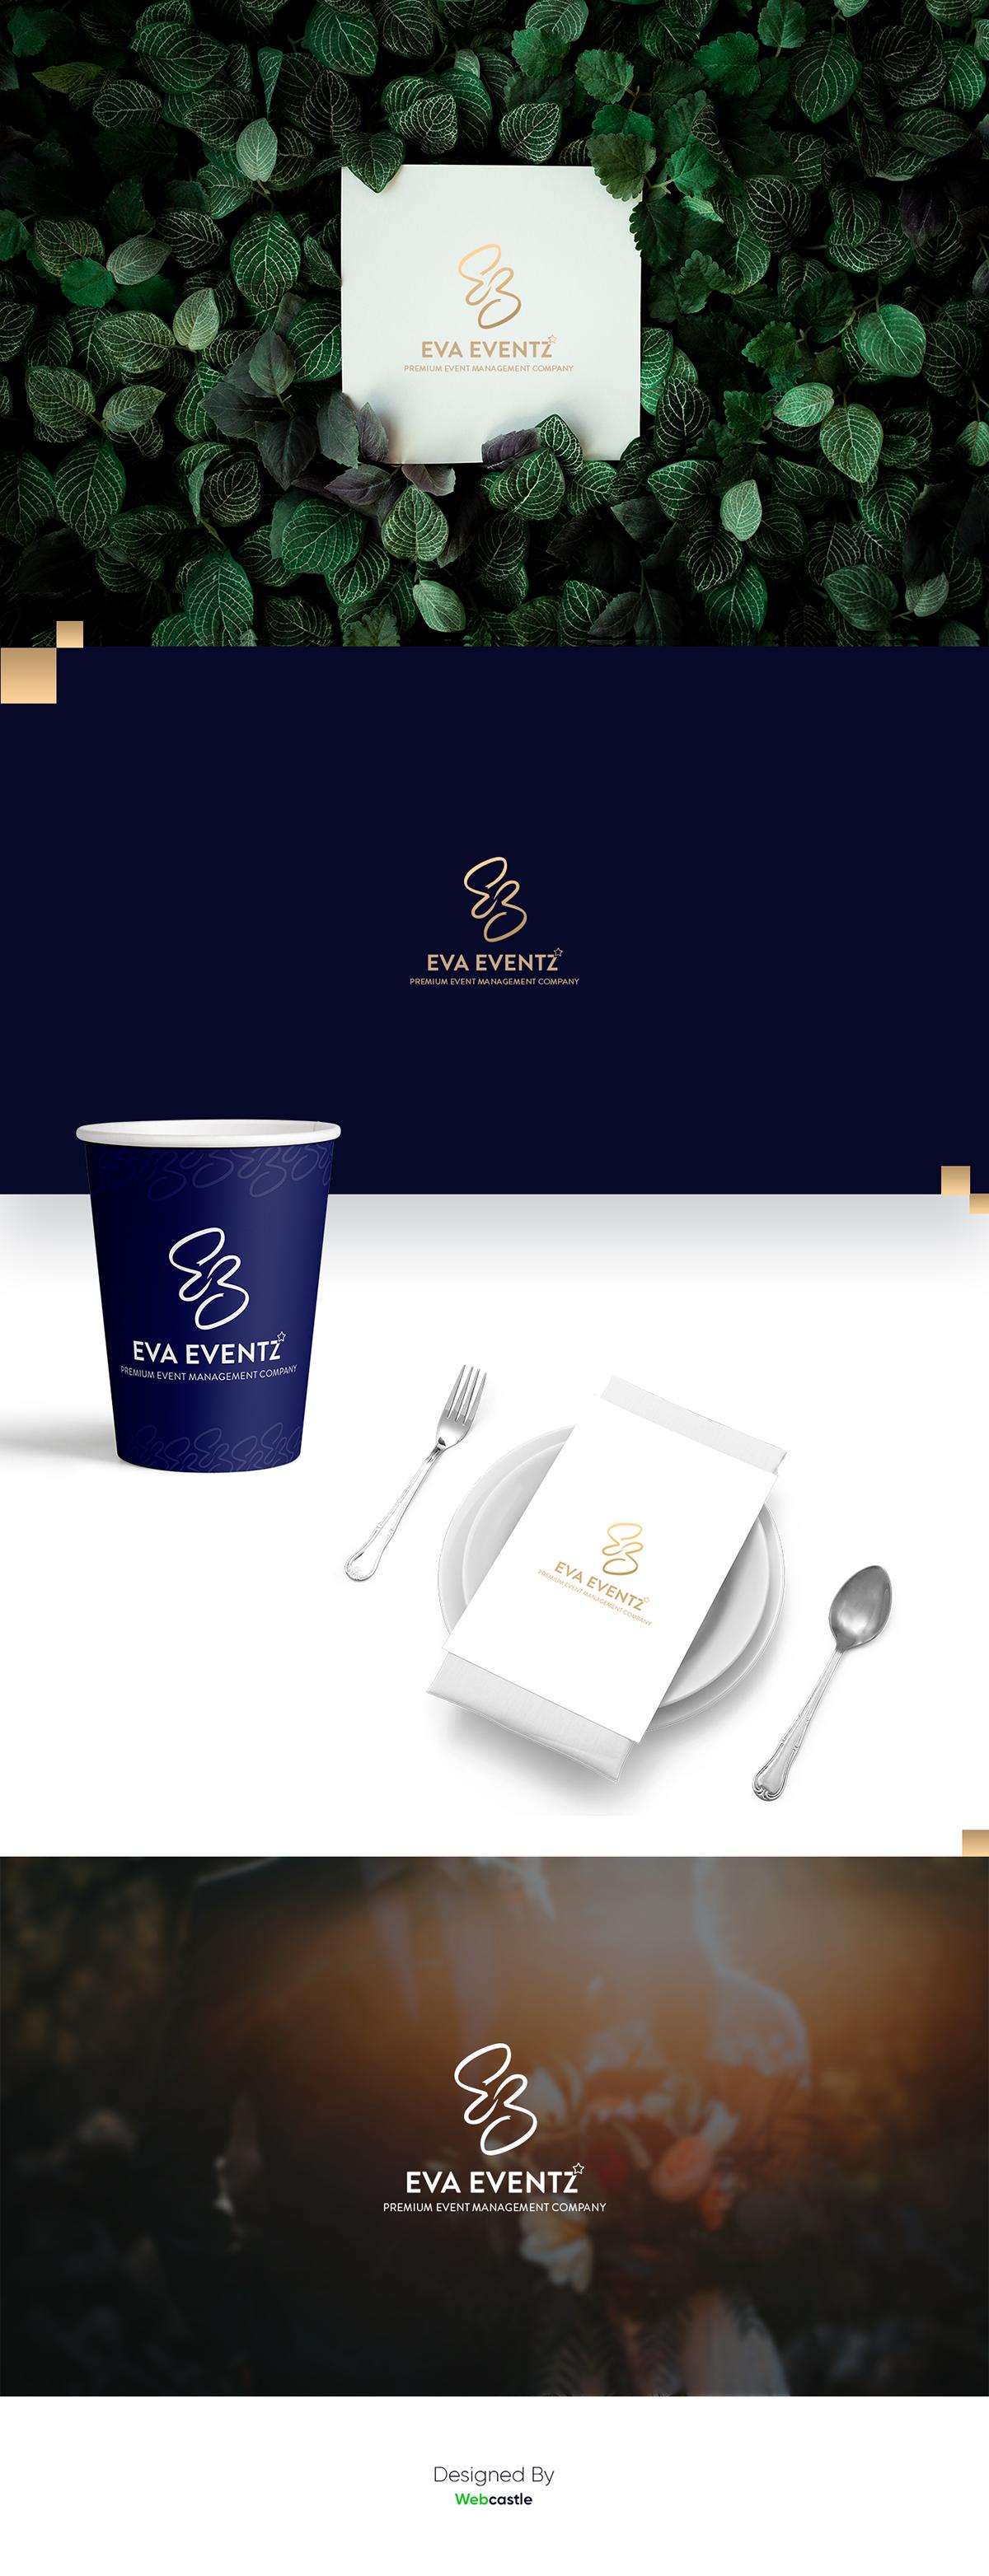 logo branding  designing logo development brand identity graphic event company Event Organiser